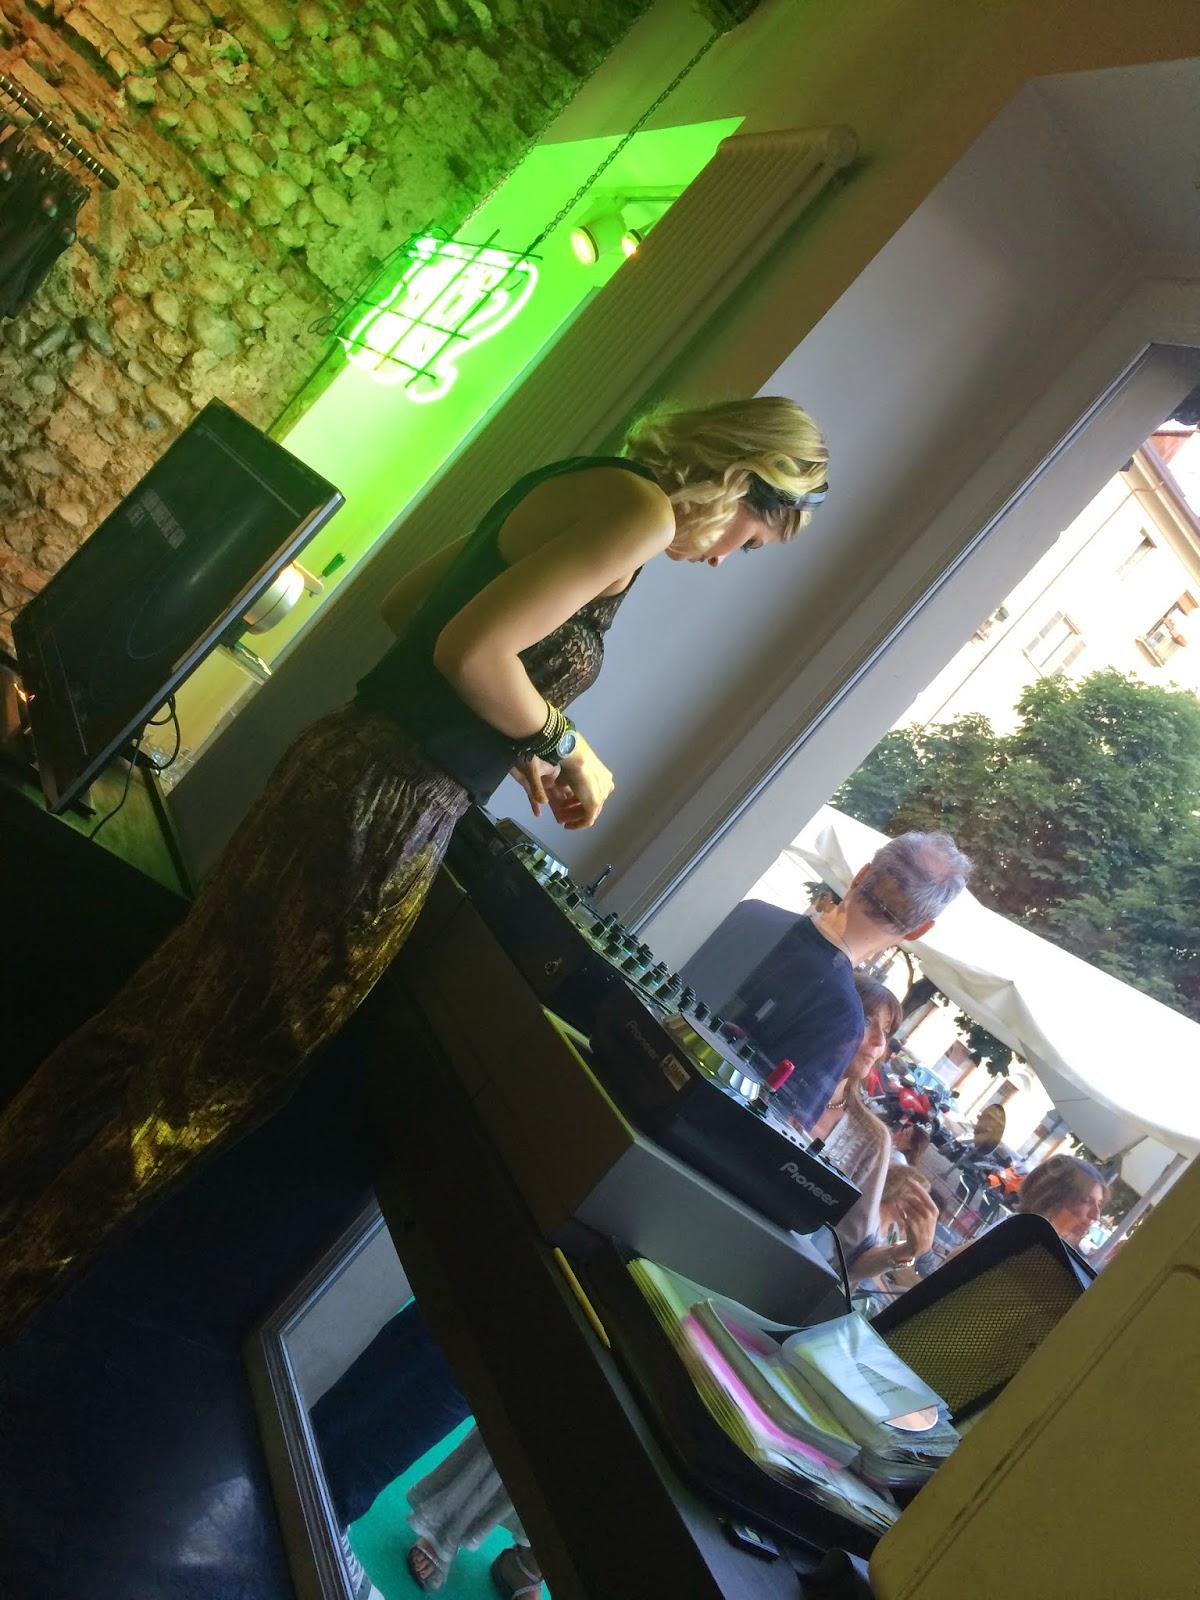 giulia napoli, Anfisa Letyago, evento , piazza carlina